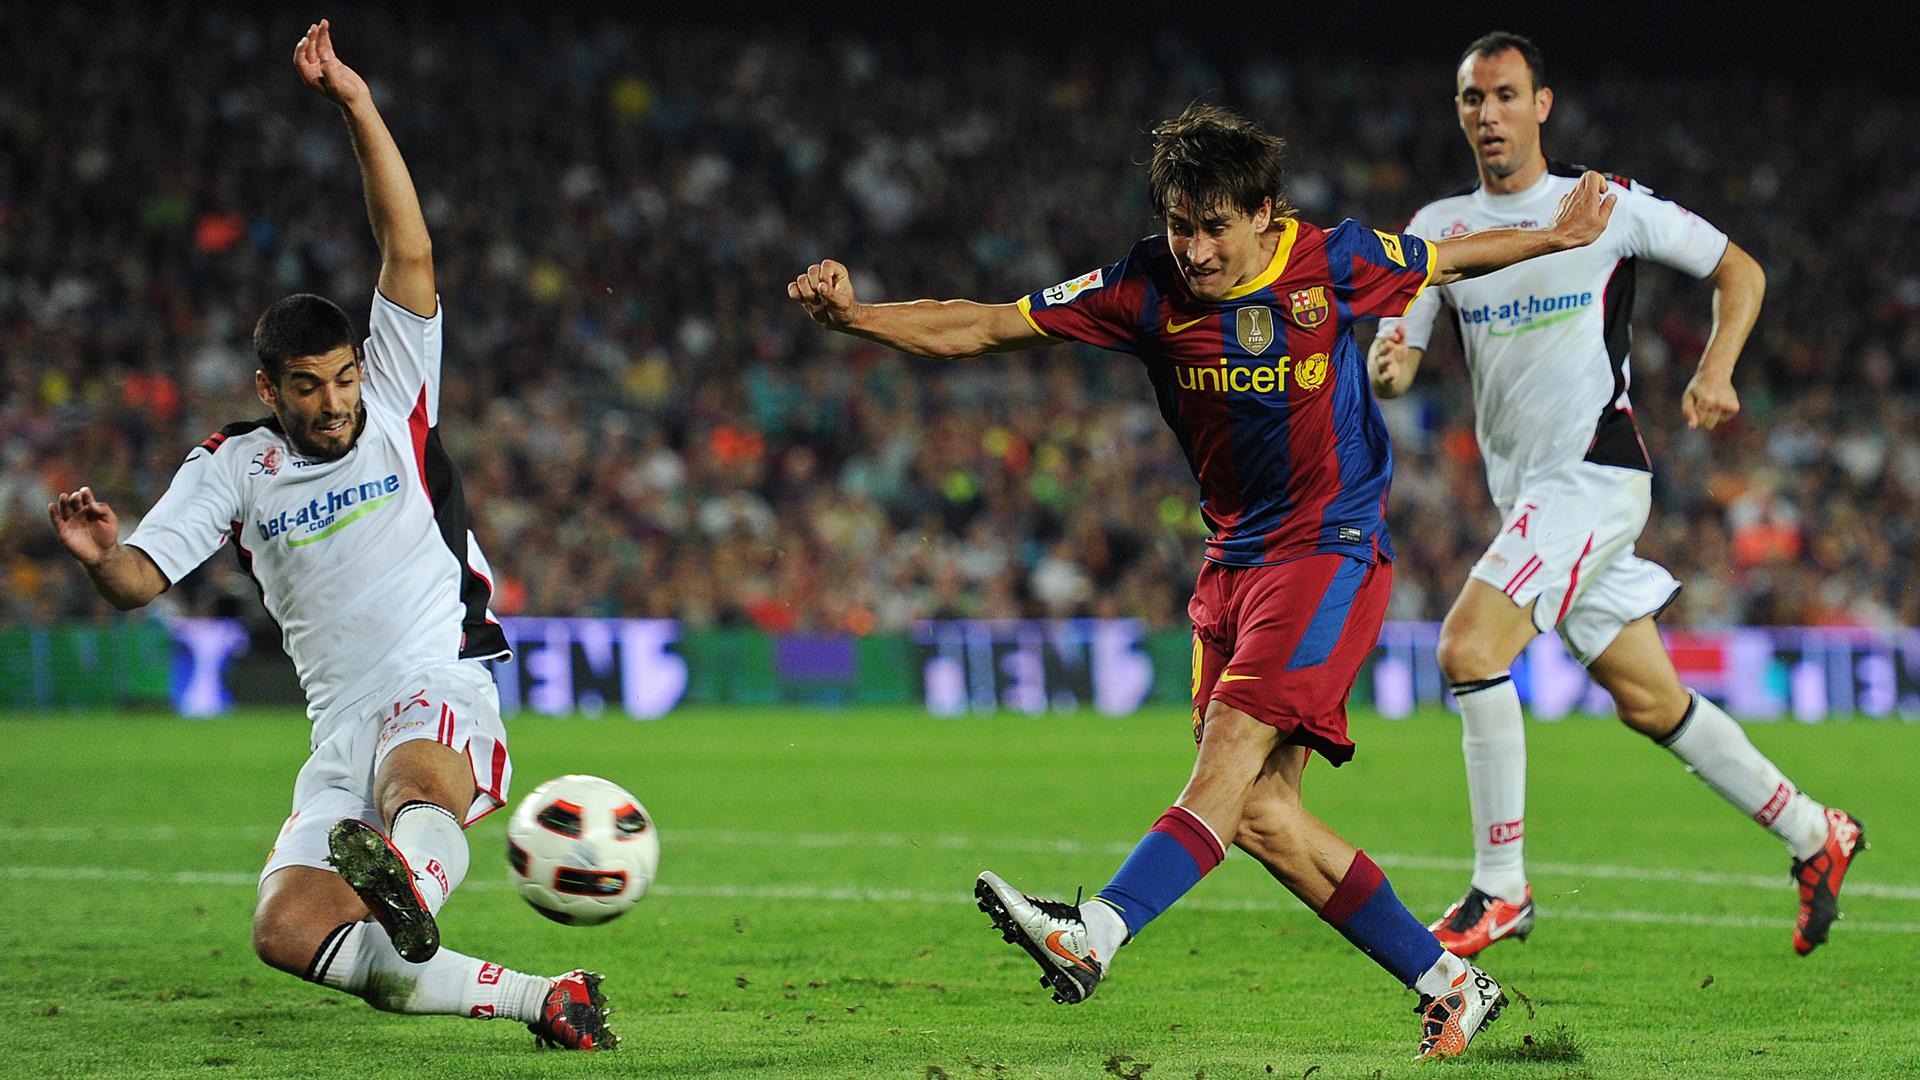 Bojan Krkic FC Barcelona Ivan Ramis RCD Mallorca Primera Division 10032010